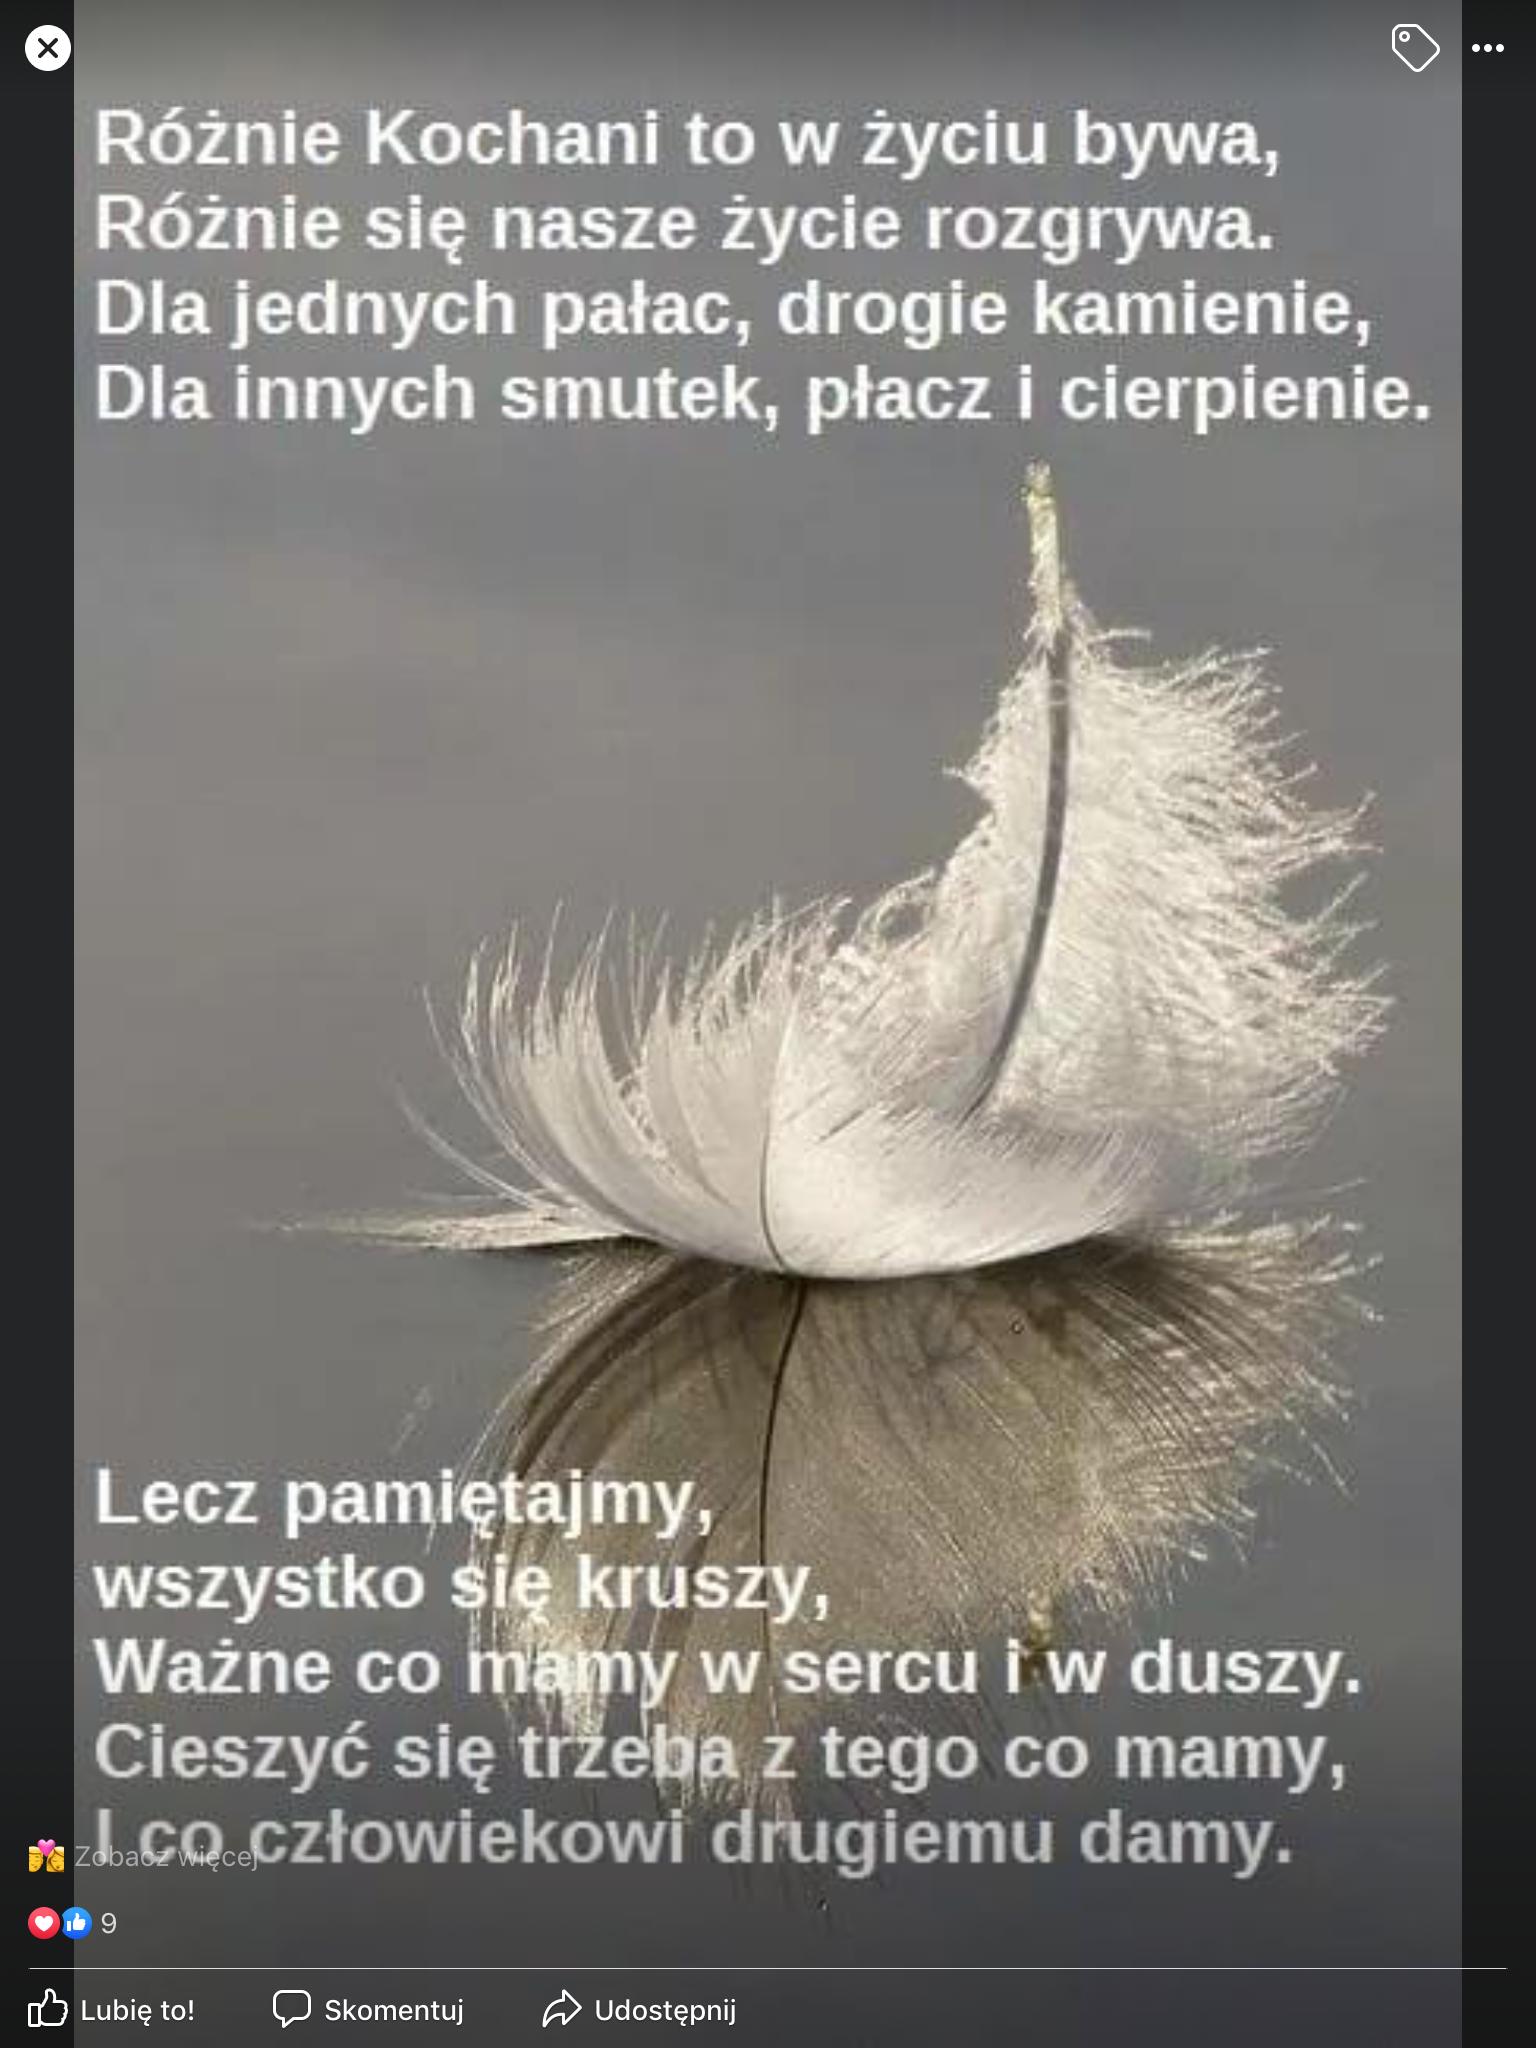 Pin By Natalia Murawska On Sentencje Powiedzenia In 2020 Insprational Quotes Love Me Quotes Good Sentences